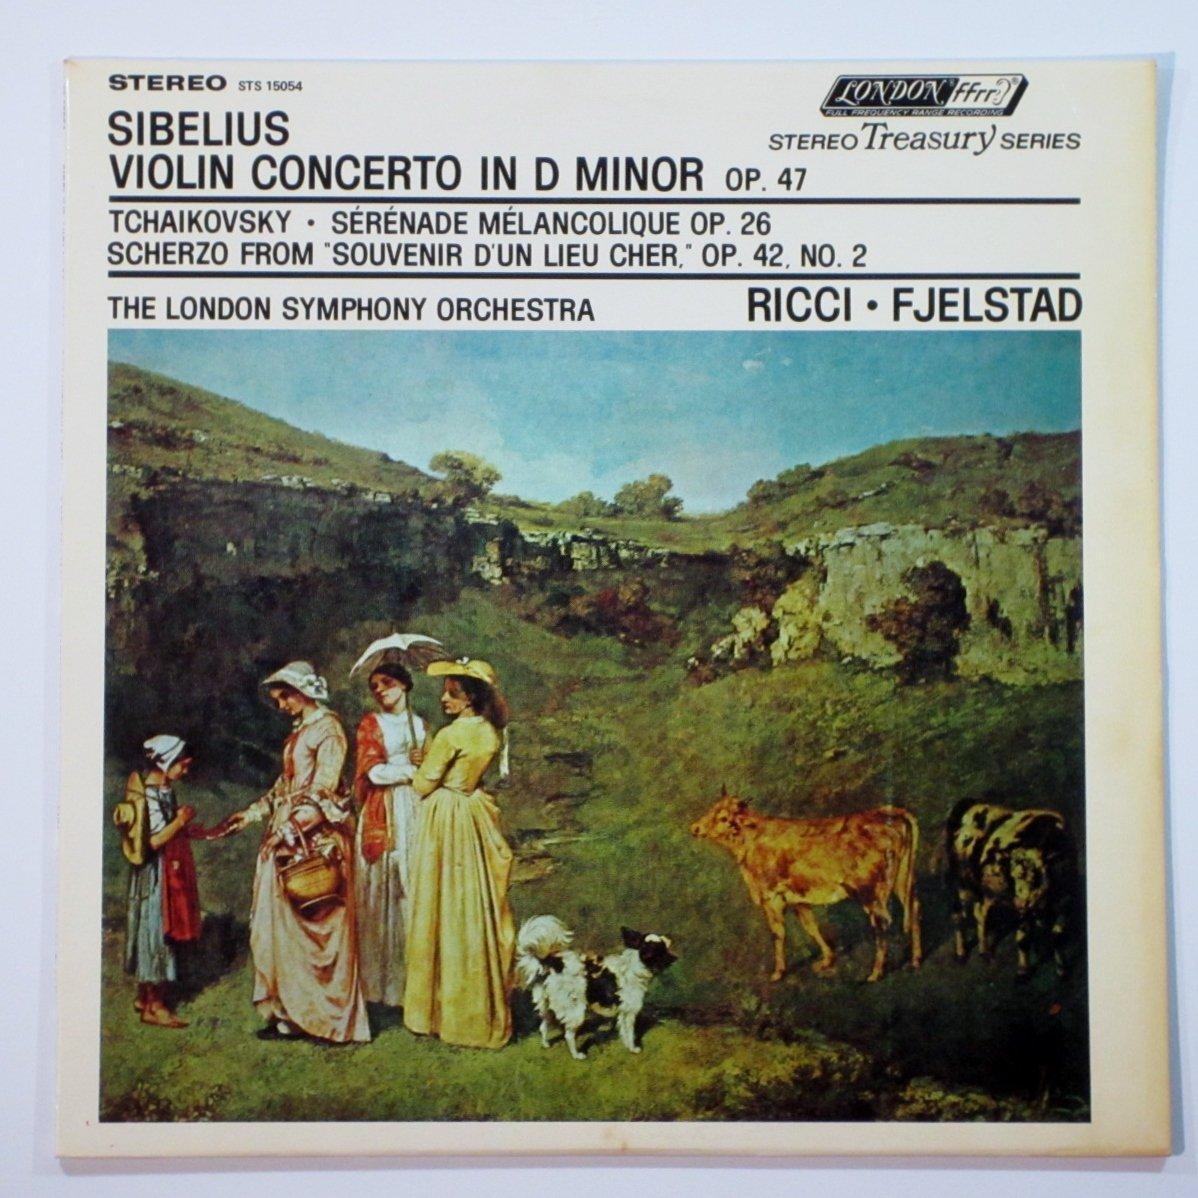 Sibelius: Violin Concerto in D Minor, Op.47 and Tchaikovsky: Serenade Melancolique, Op.26 and Scherzo From ''Souvenir D'un Lieu Cher, Op.42, No.2 Lp /Ruggiero Ricci, Violin /The London Symphony Orchestra / Oivin Fjelstad, Conductor by LONDON